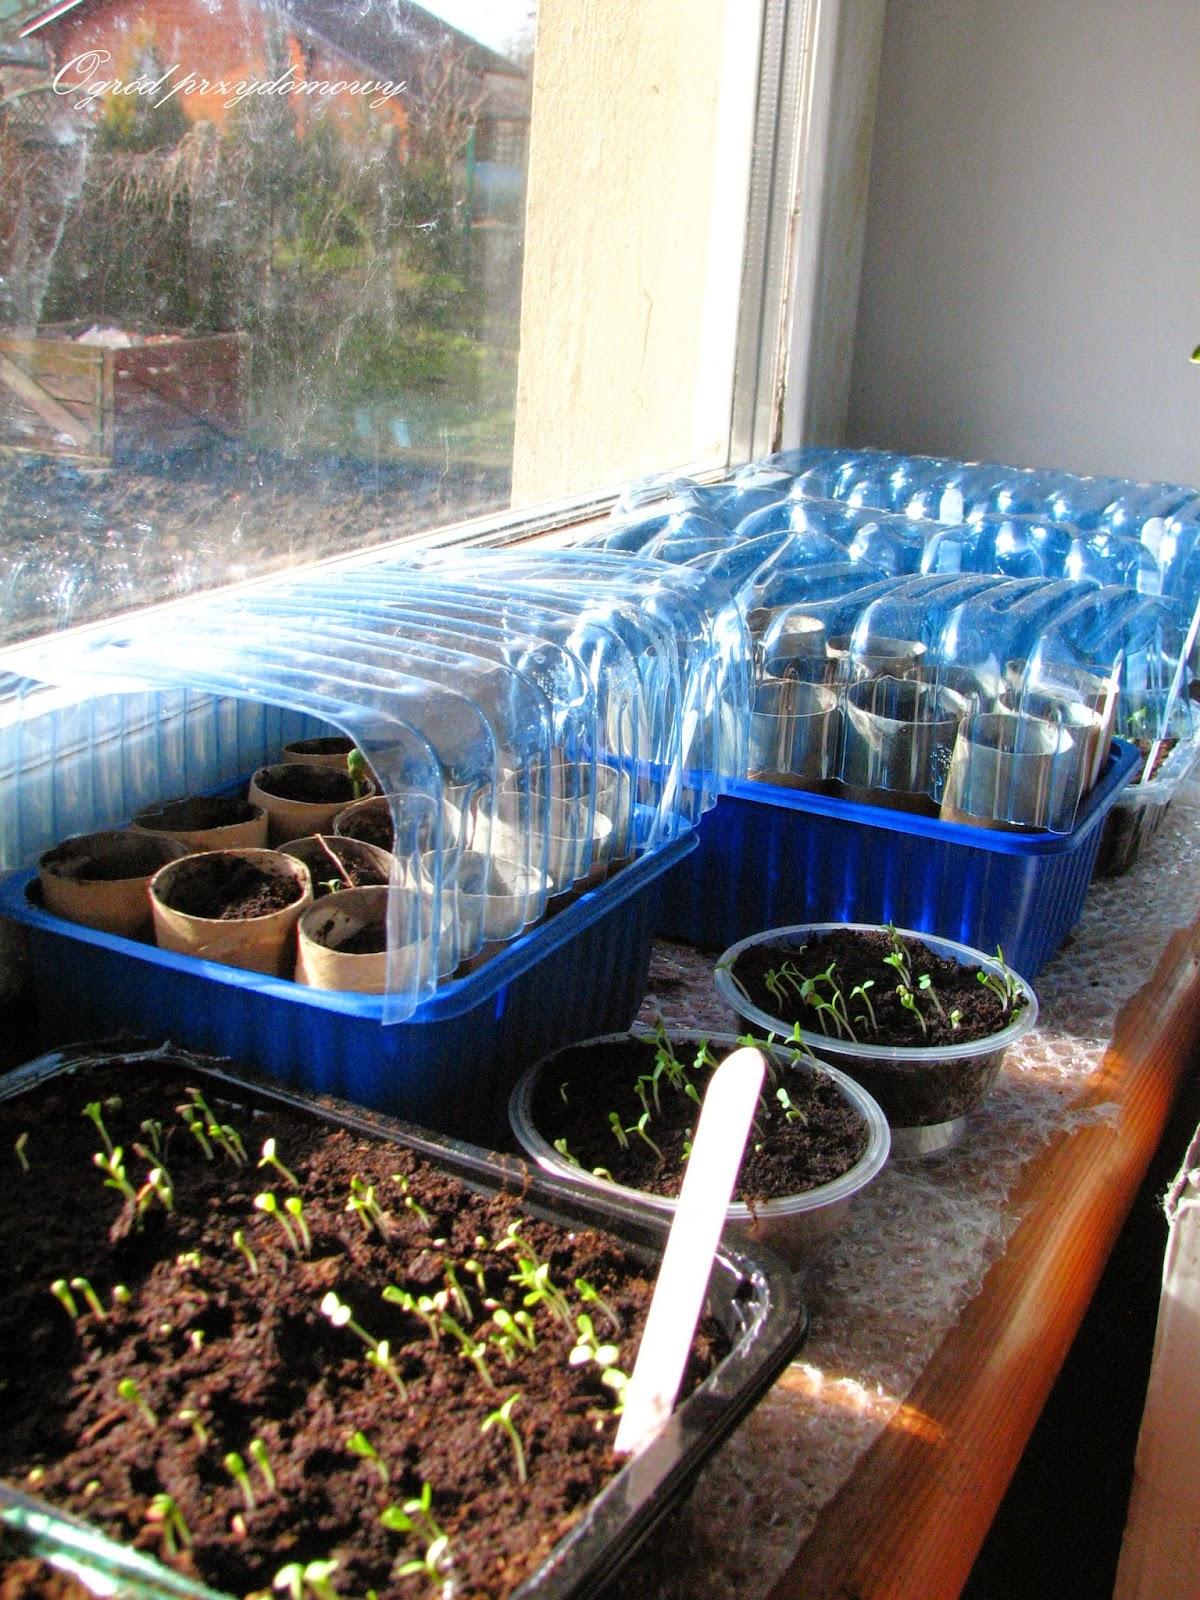 eko doniczki, ogród za grosze, ekologiczne doniczki, plastikowe szklarenki z butelek, szklarenki z butelek plastikowych, ogród przydomowy